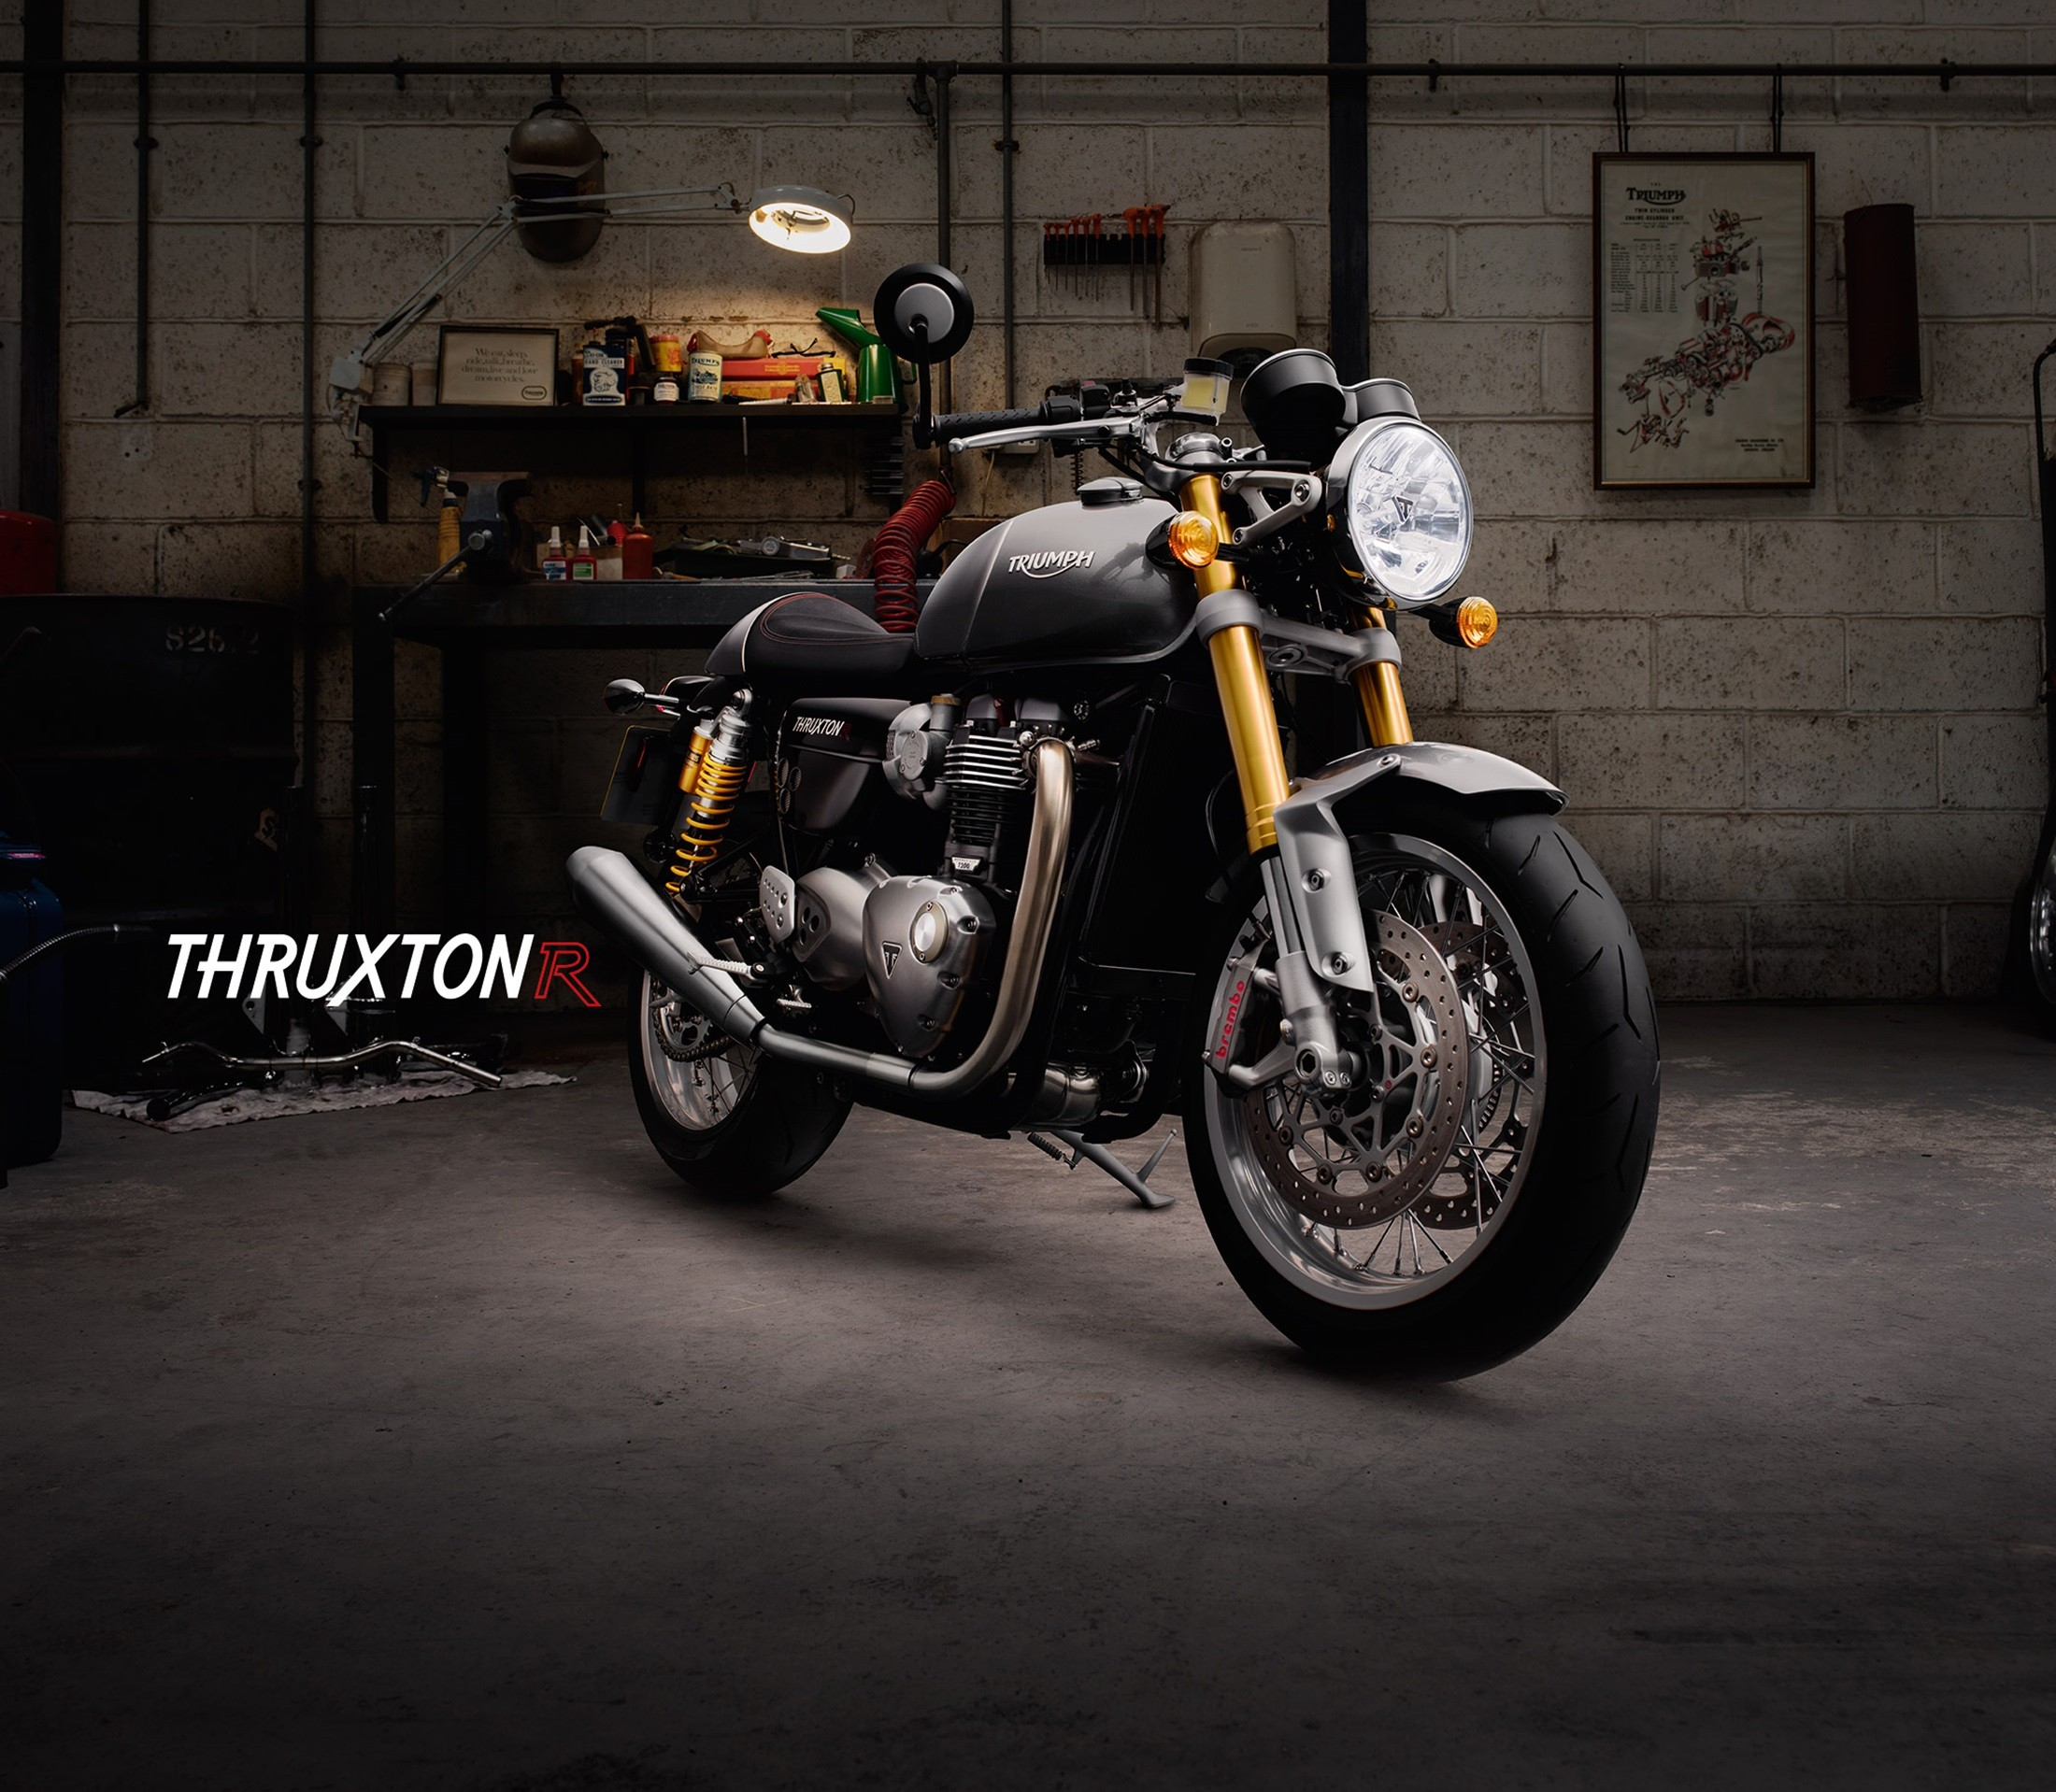 2016 Triumph Thruxton And Thruxton R Shown Looking Like Real Neo